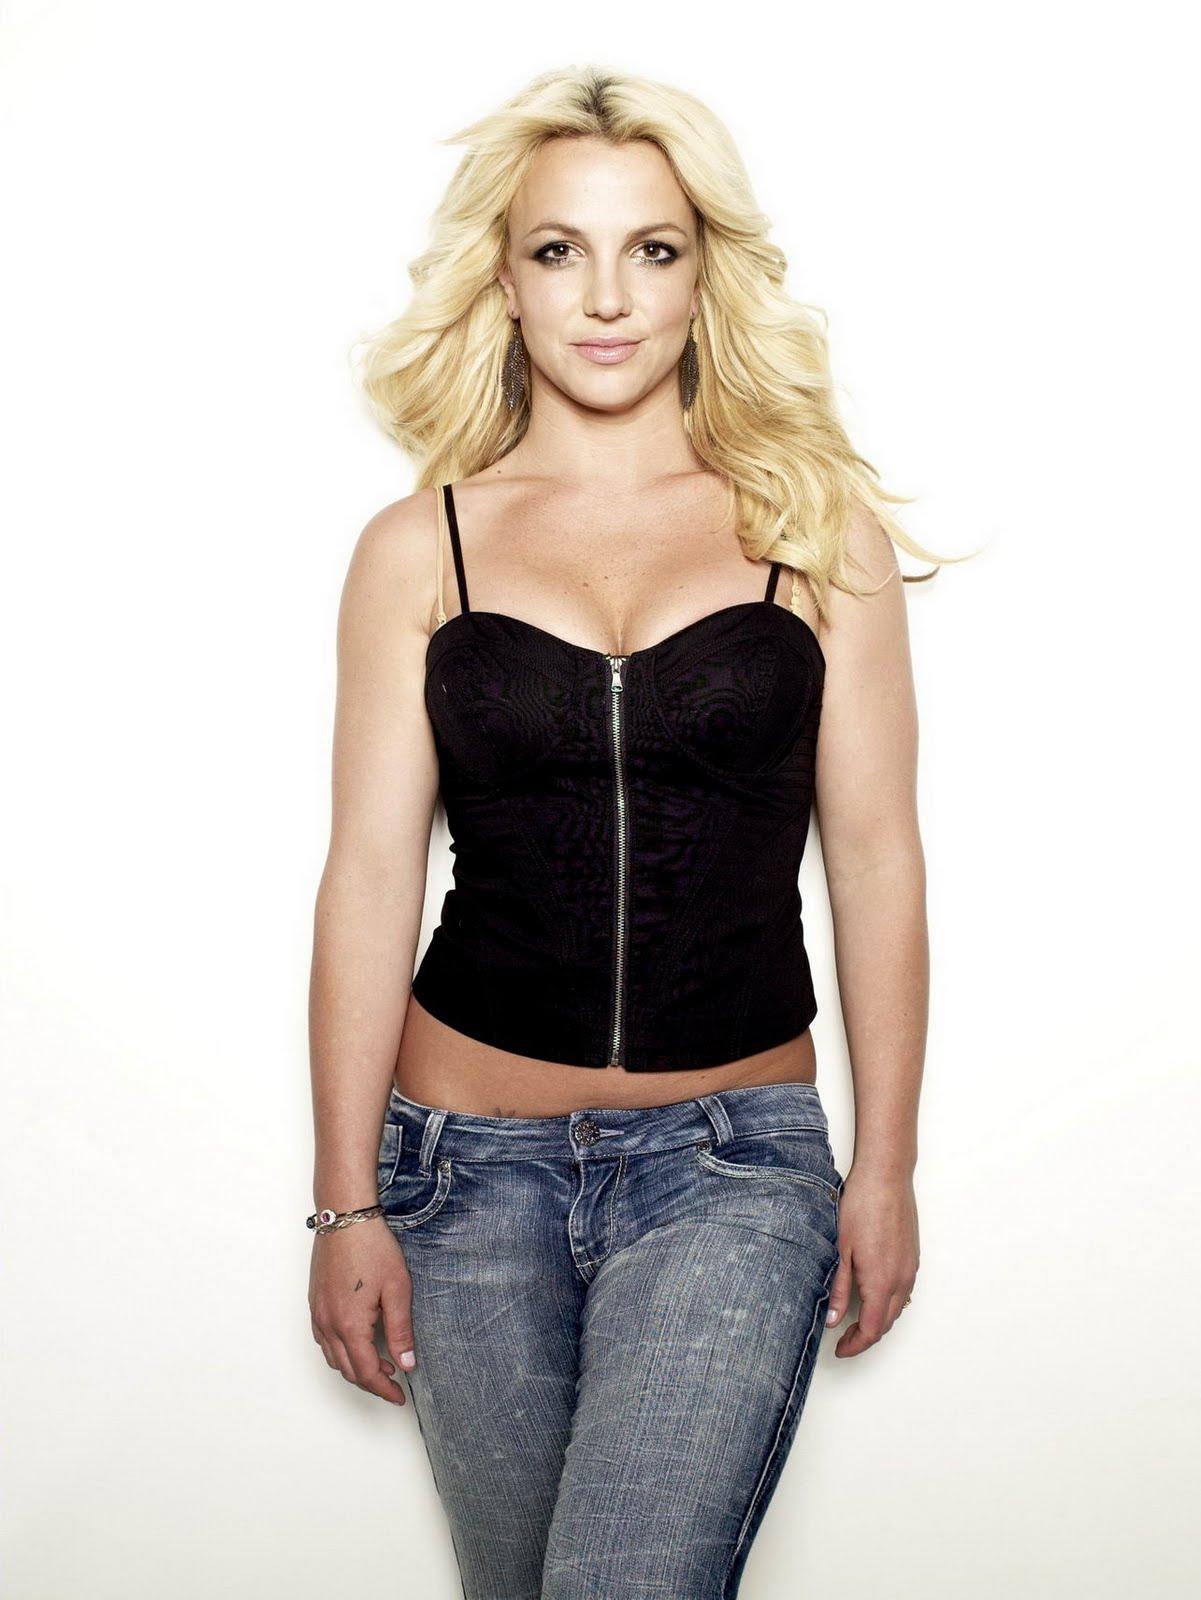 http://2.bp.blogspot.com/_cyH_7sPxVcQ/TJYv-kf7yMI/AAAAAAAAF5M/uq7NFW22CQs/s1600/Britney%2BSpears%2Bin%2Bblack%2Btank%2Btop%2Bfor%2BCosmo%2B(9).jpg